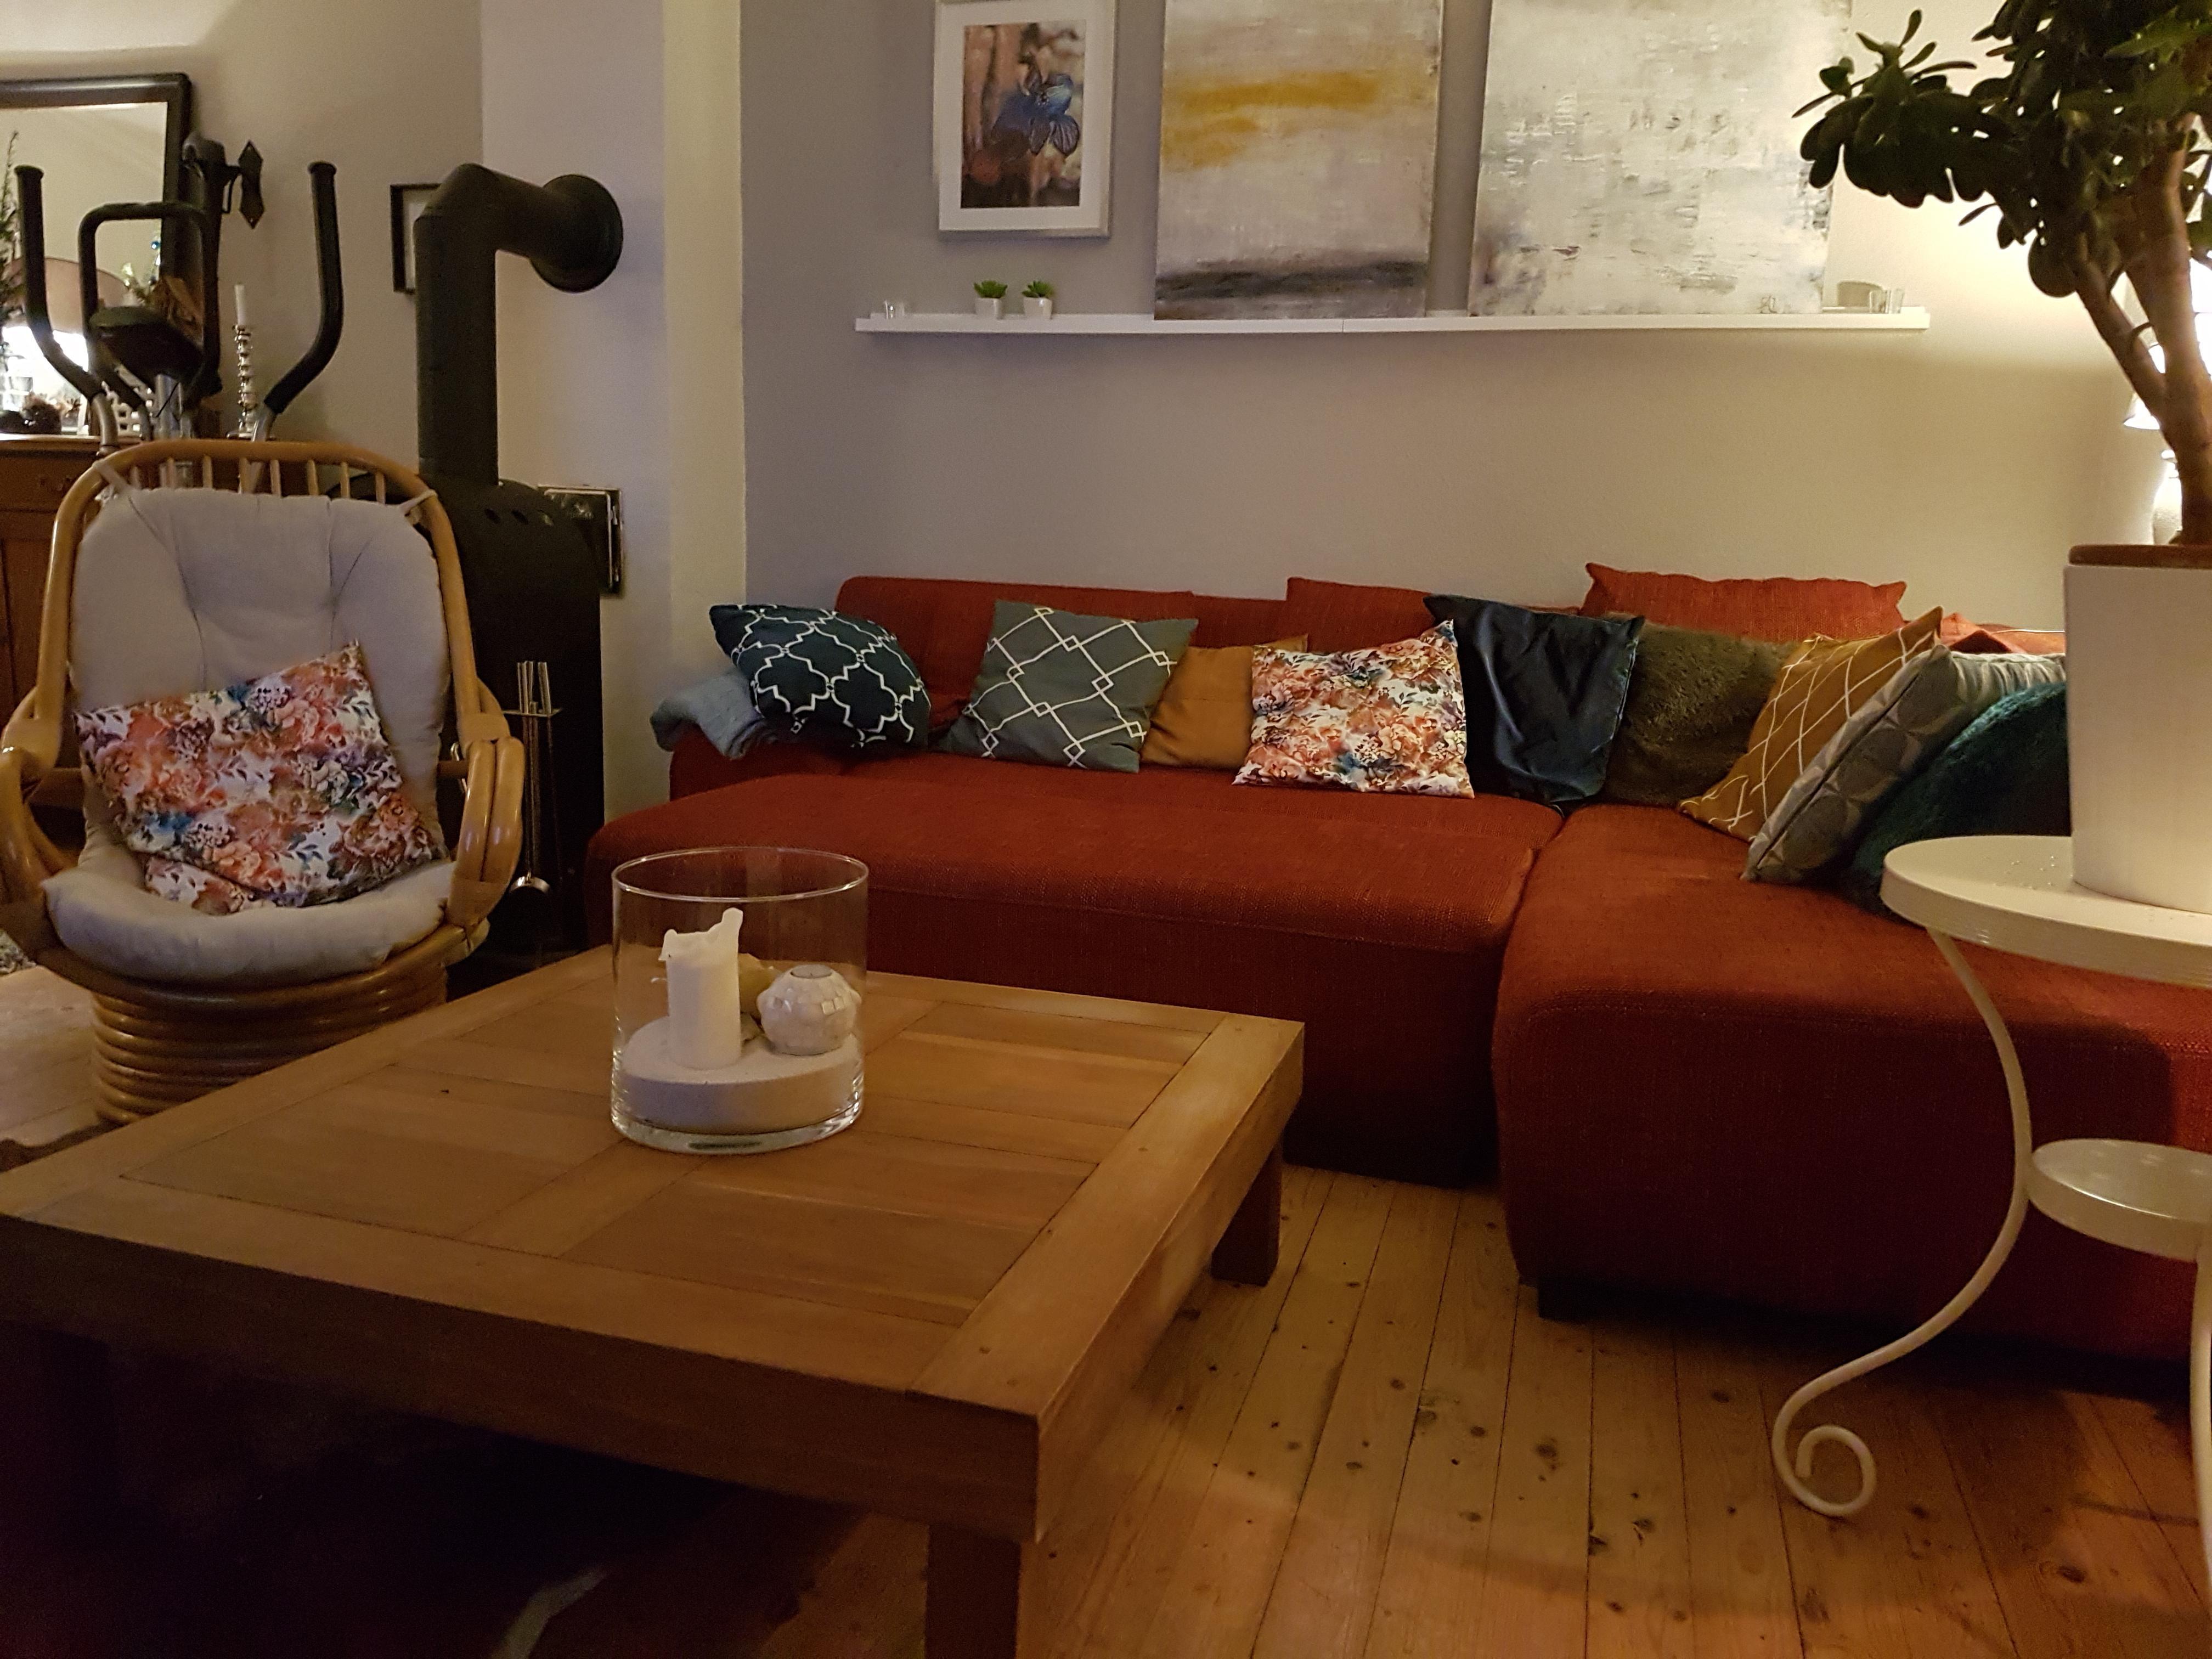 full size of uncategorizedtolles wohnzimmer blau rot ebenfalls ...